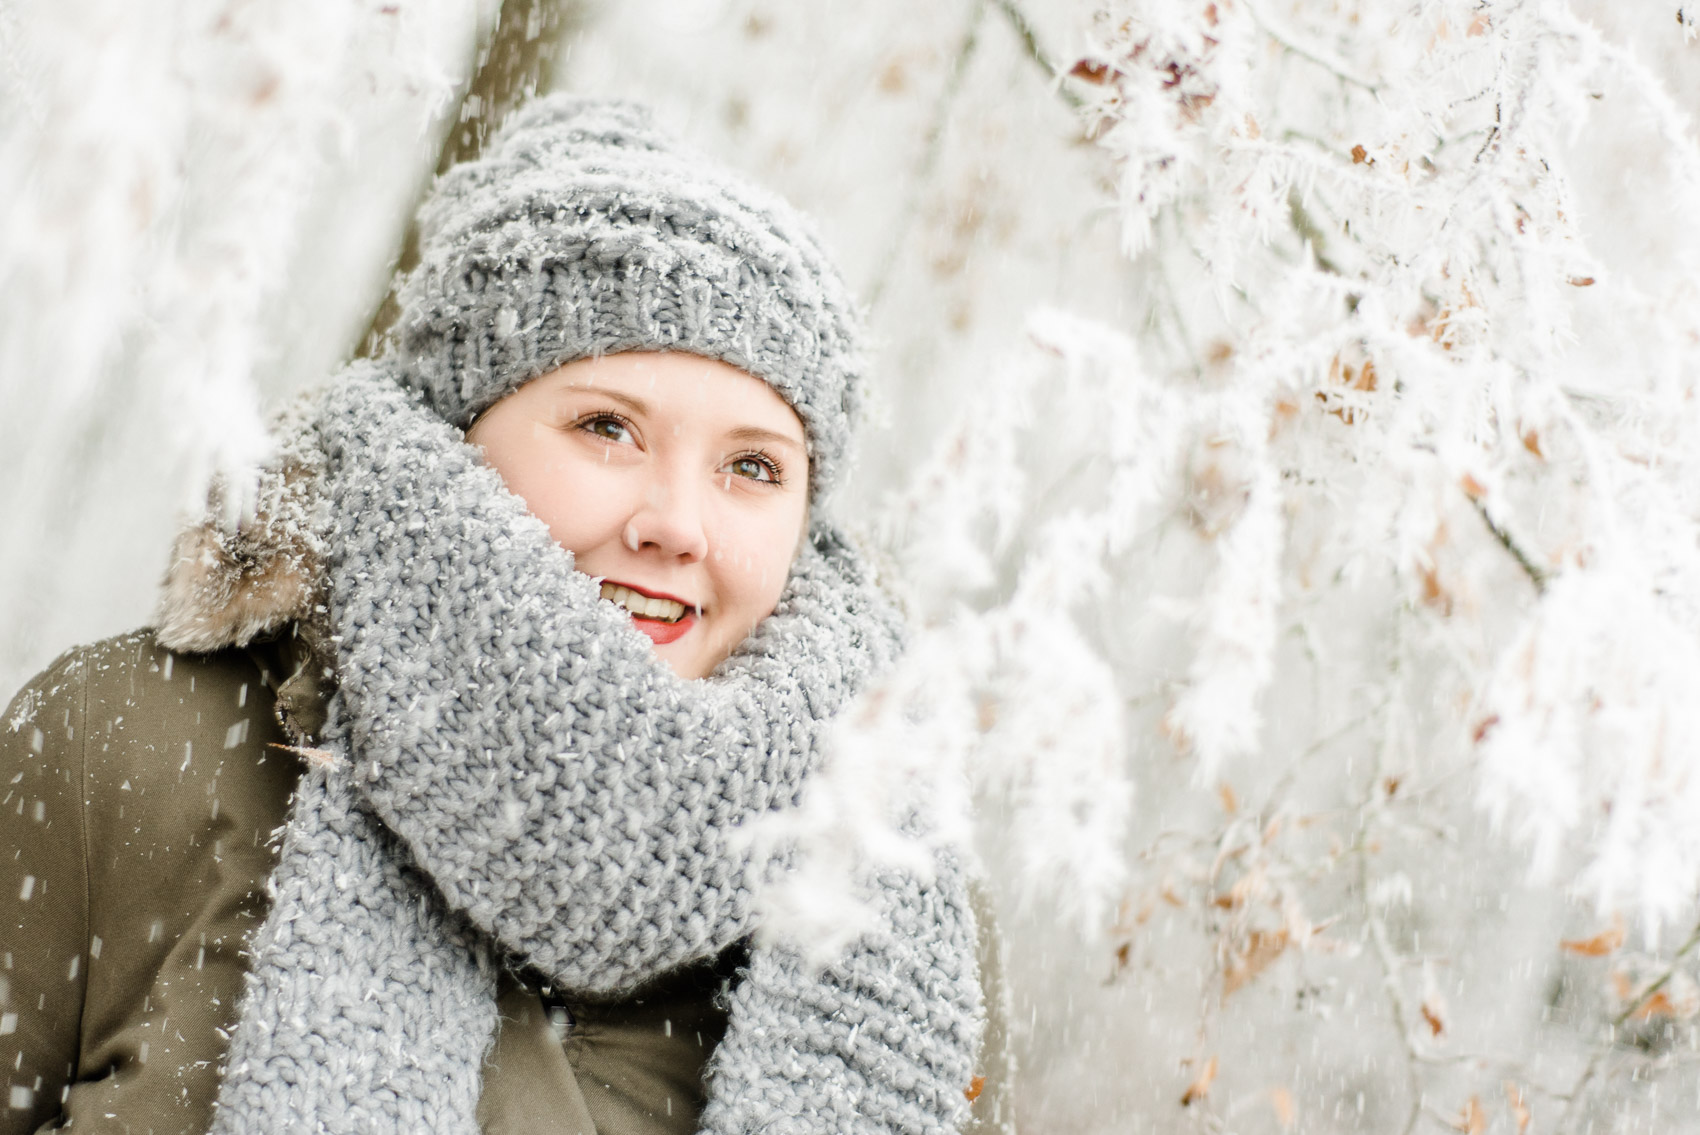 schwestern_frost_claudiaeckert-8